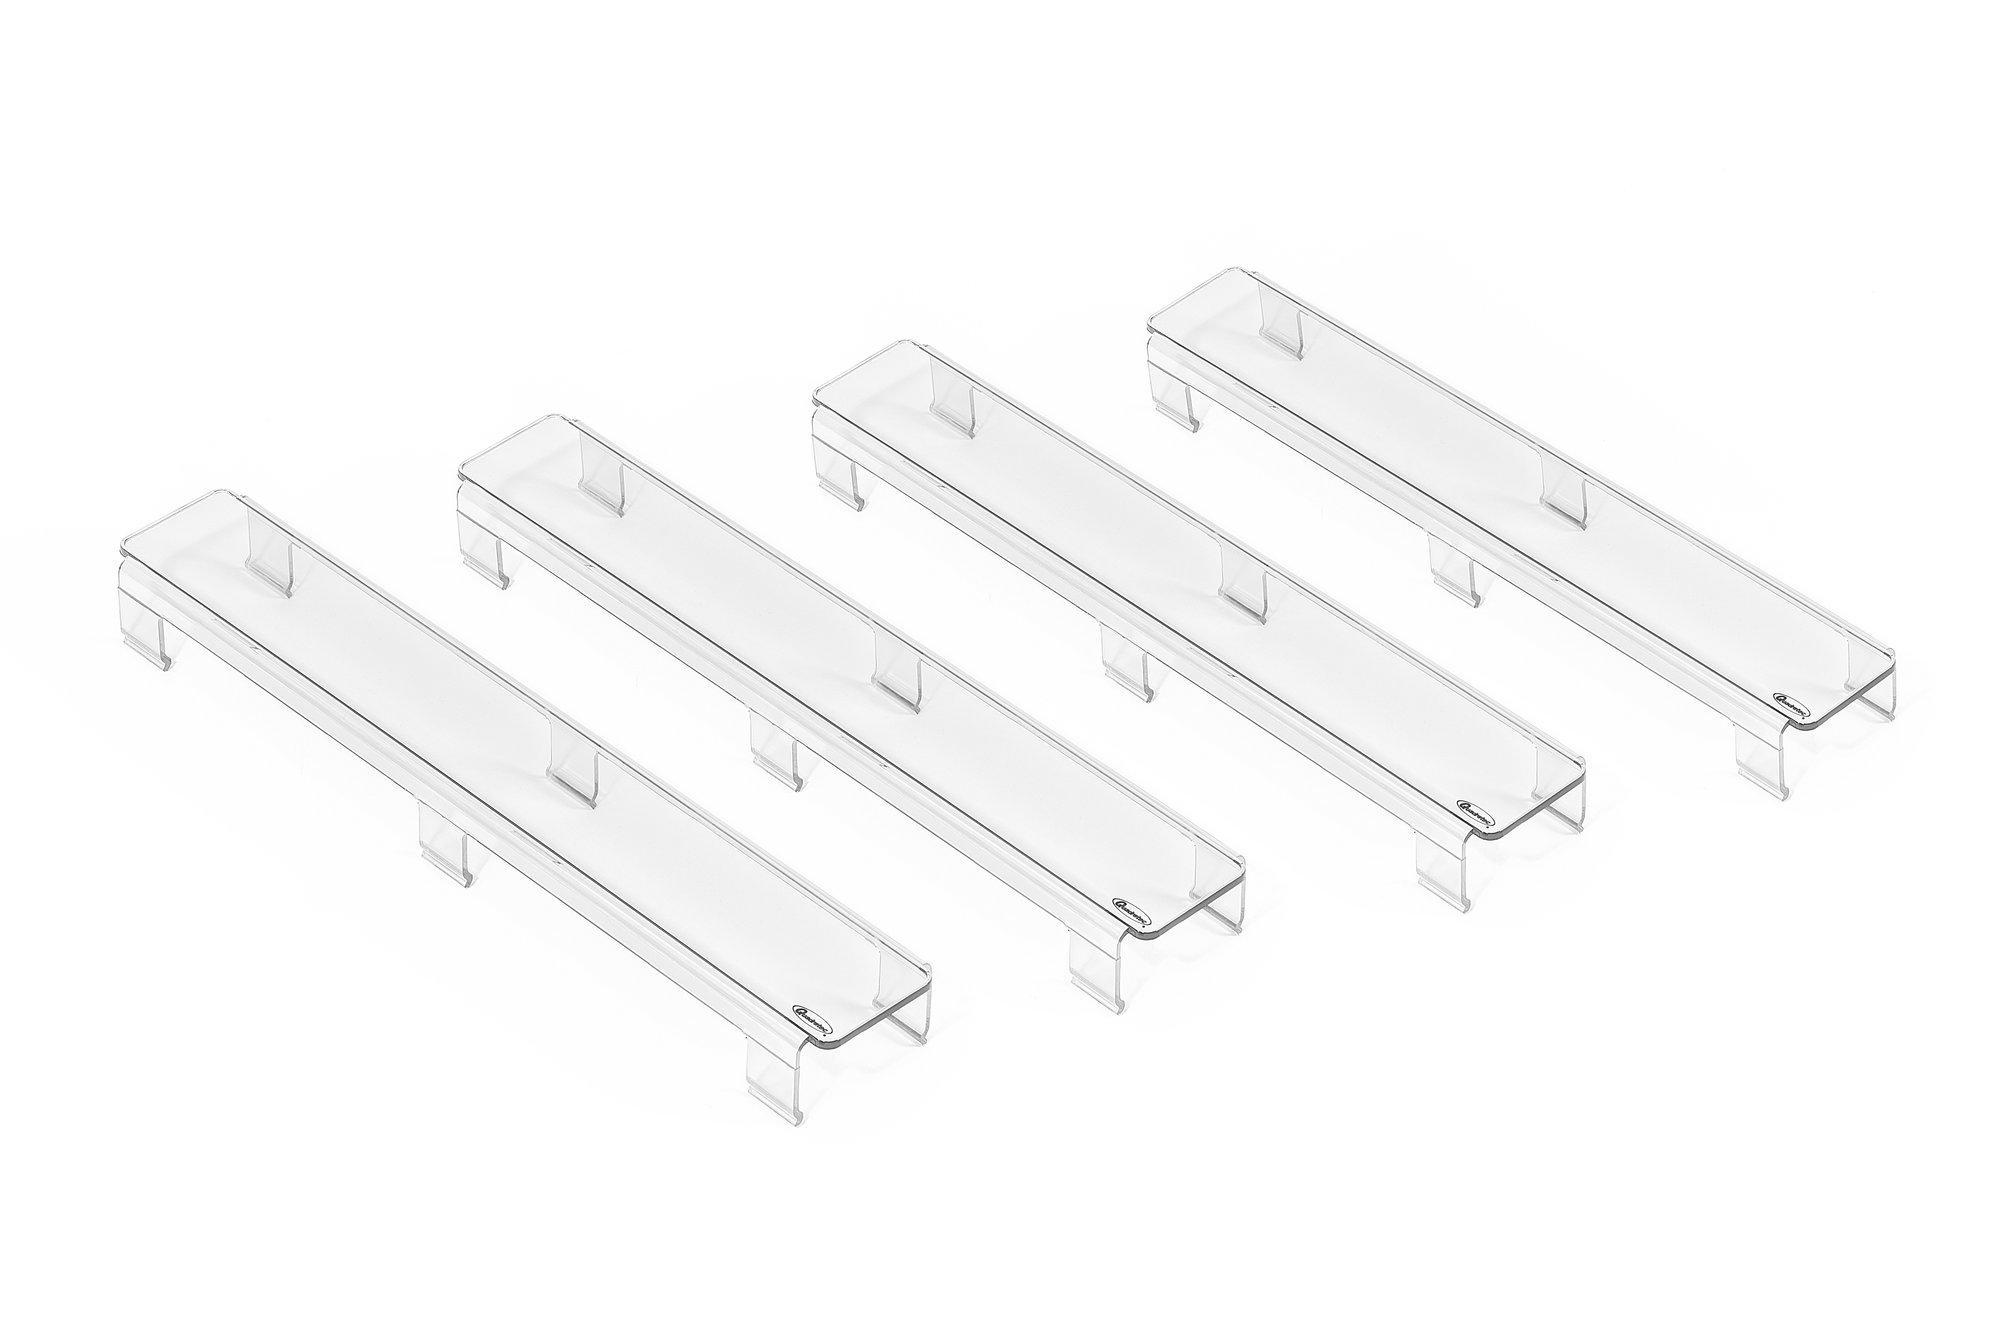 Quadratec Light Covers For 51 Led Light Bar